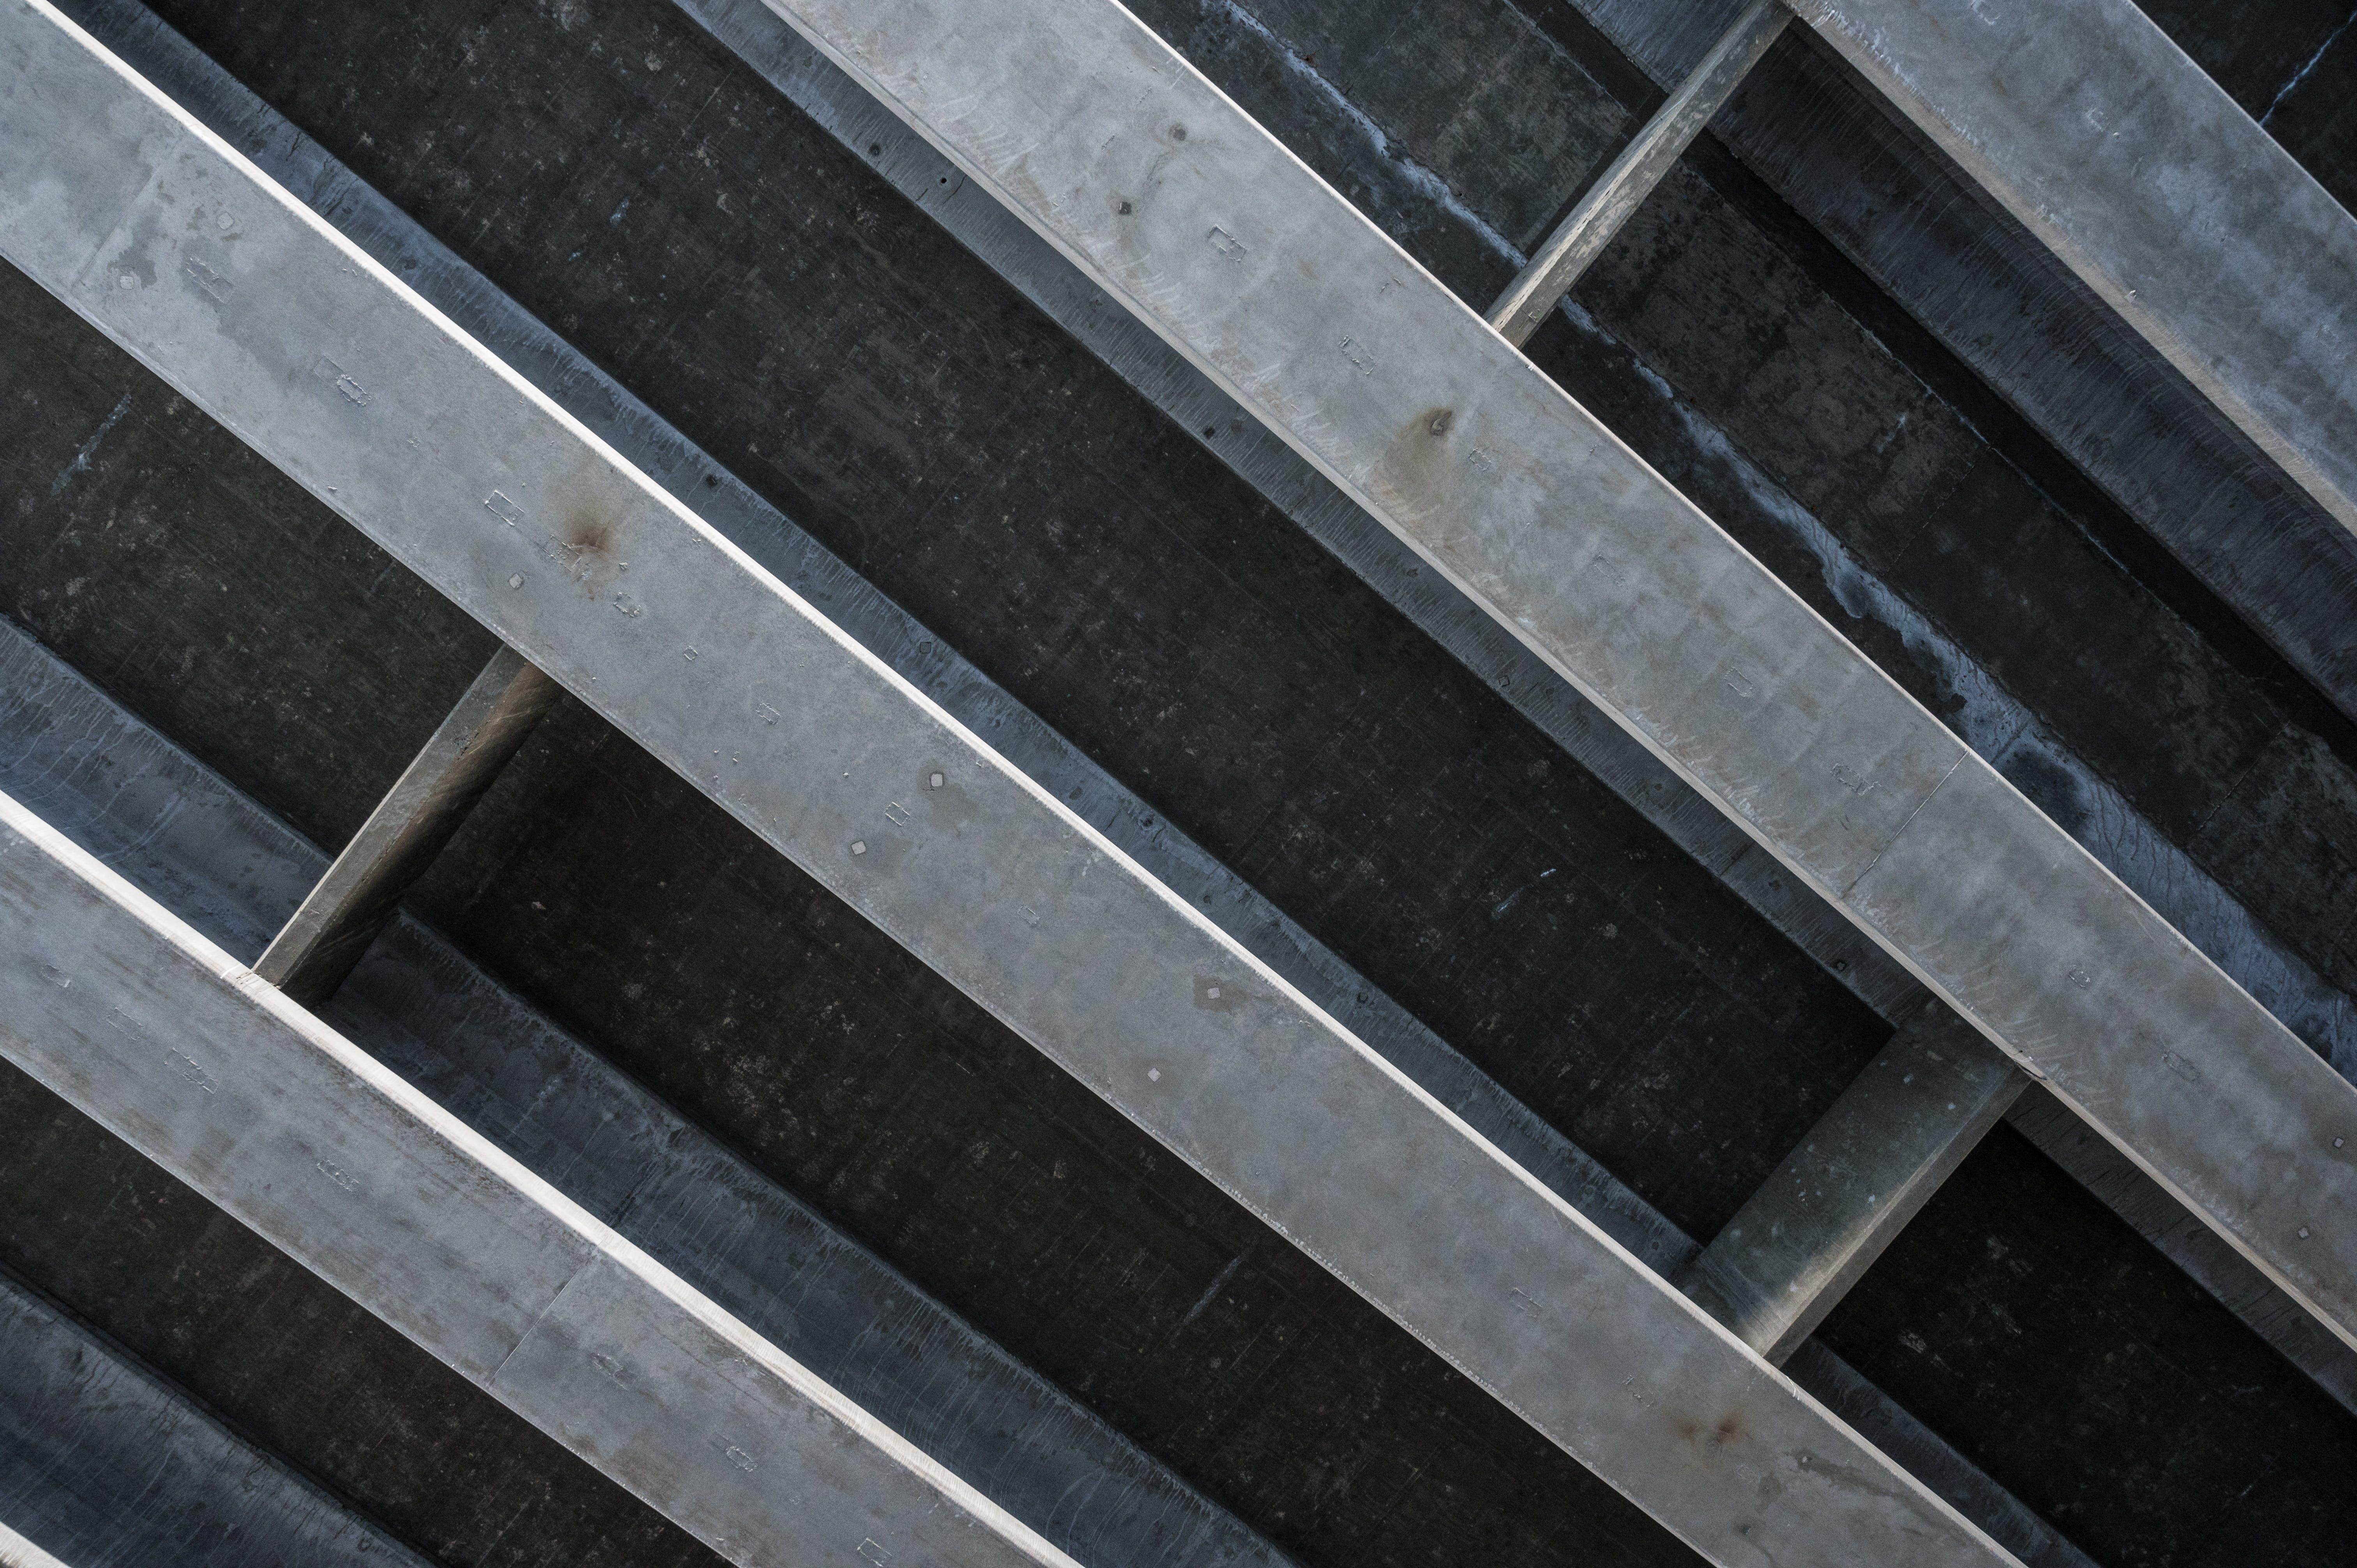 Gratis stockfoto met architectueel design, architectuur, beton, betonnen constructie